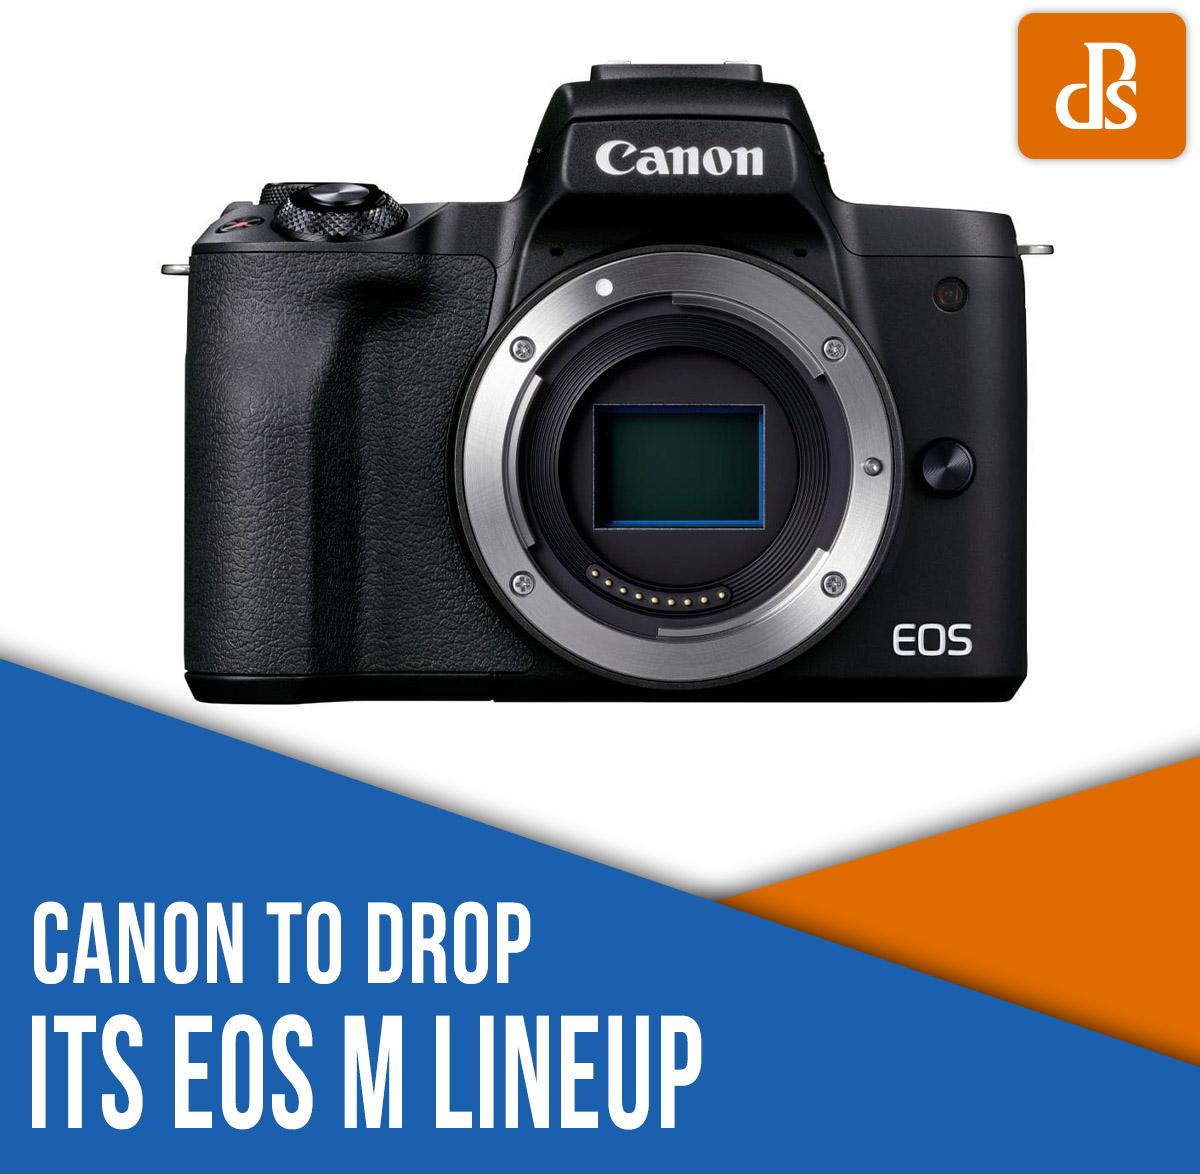 https://i0.wp.com/digital-photography-school.com/wp-content/uploads/2021/01/Canon-to-drop-EOS-M-lineup-15.jpg?resize=1200%2C1174&ssl=1